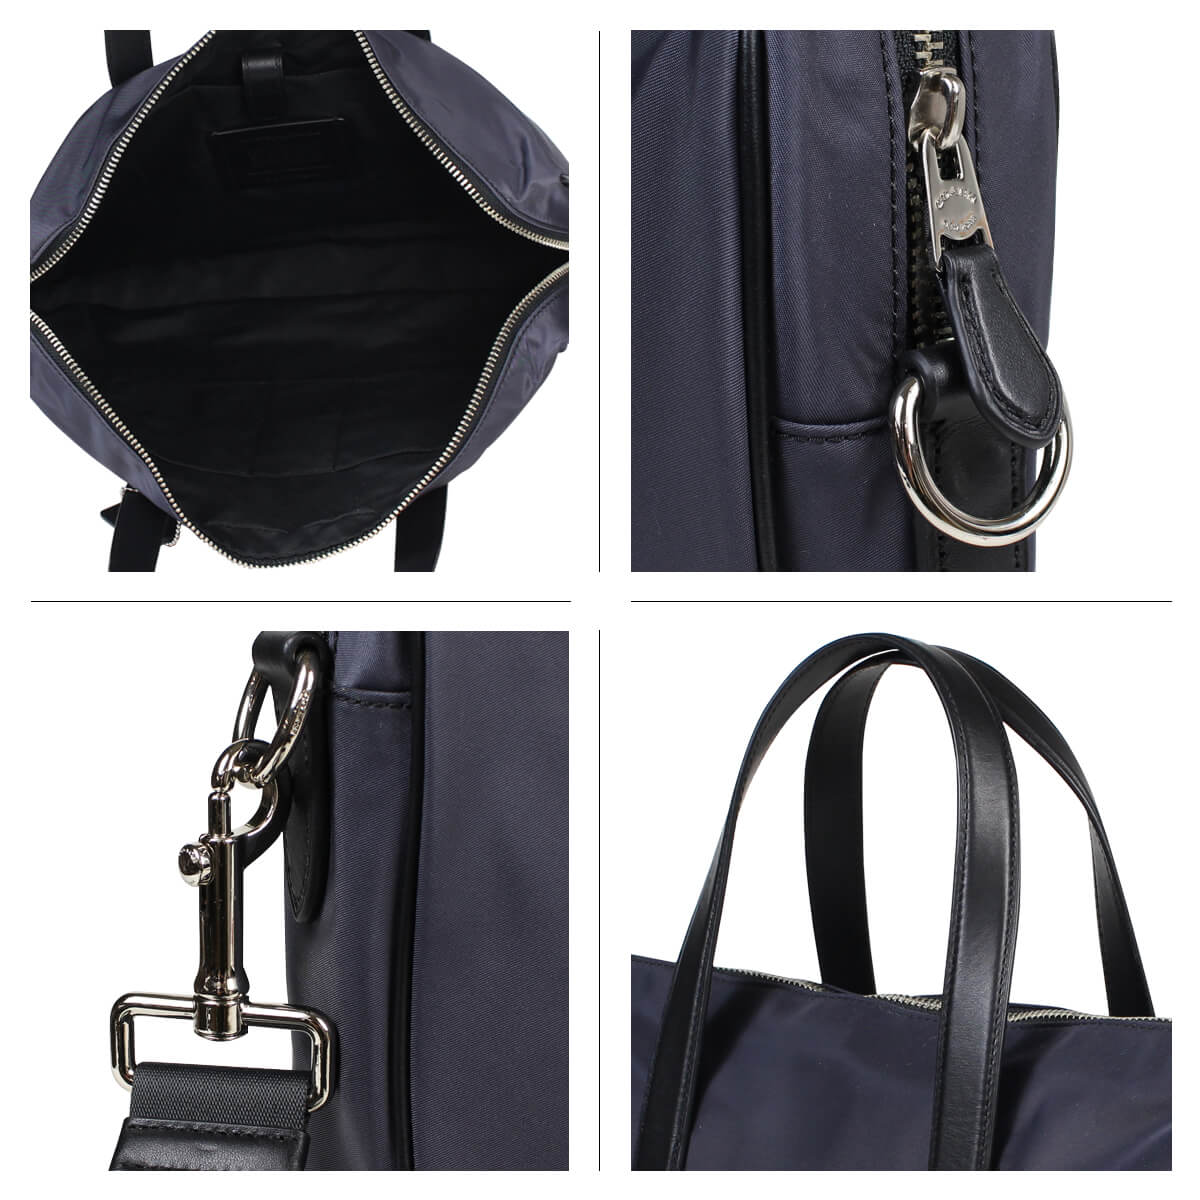 912af364 COACH coach bag business bag men briefcase CHARLES SLIM BRIEF F21087 navy